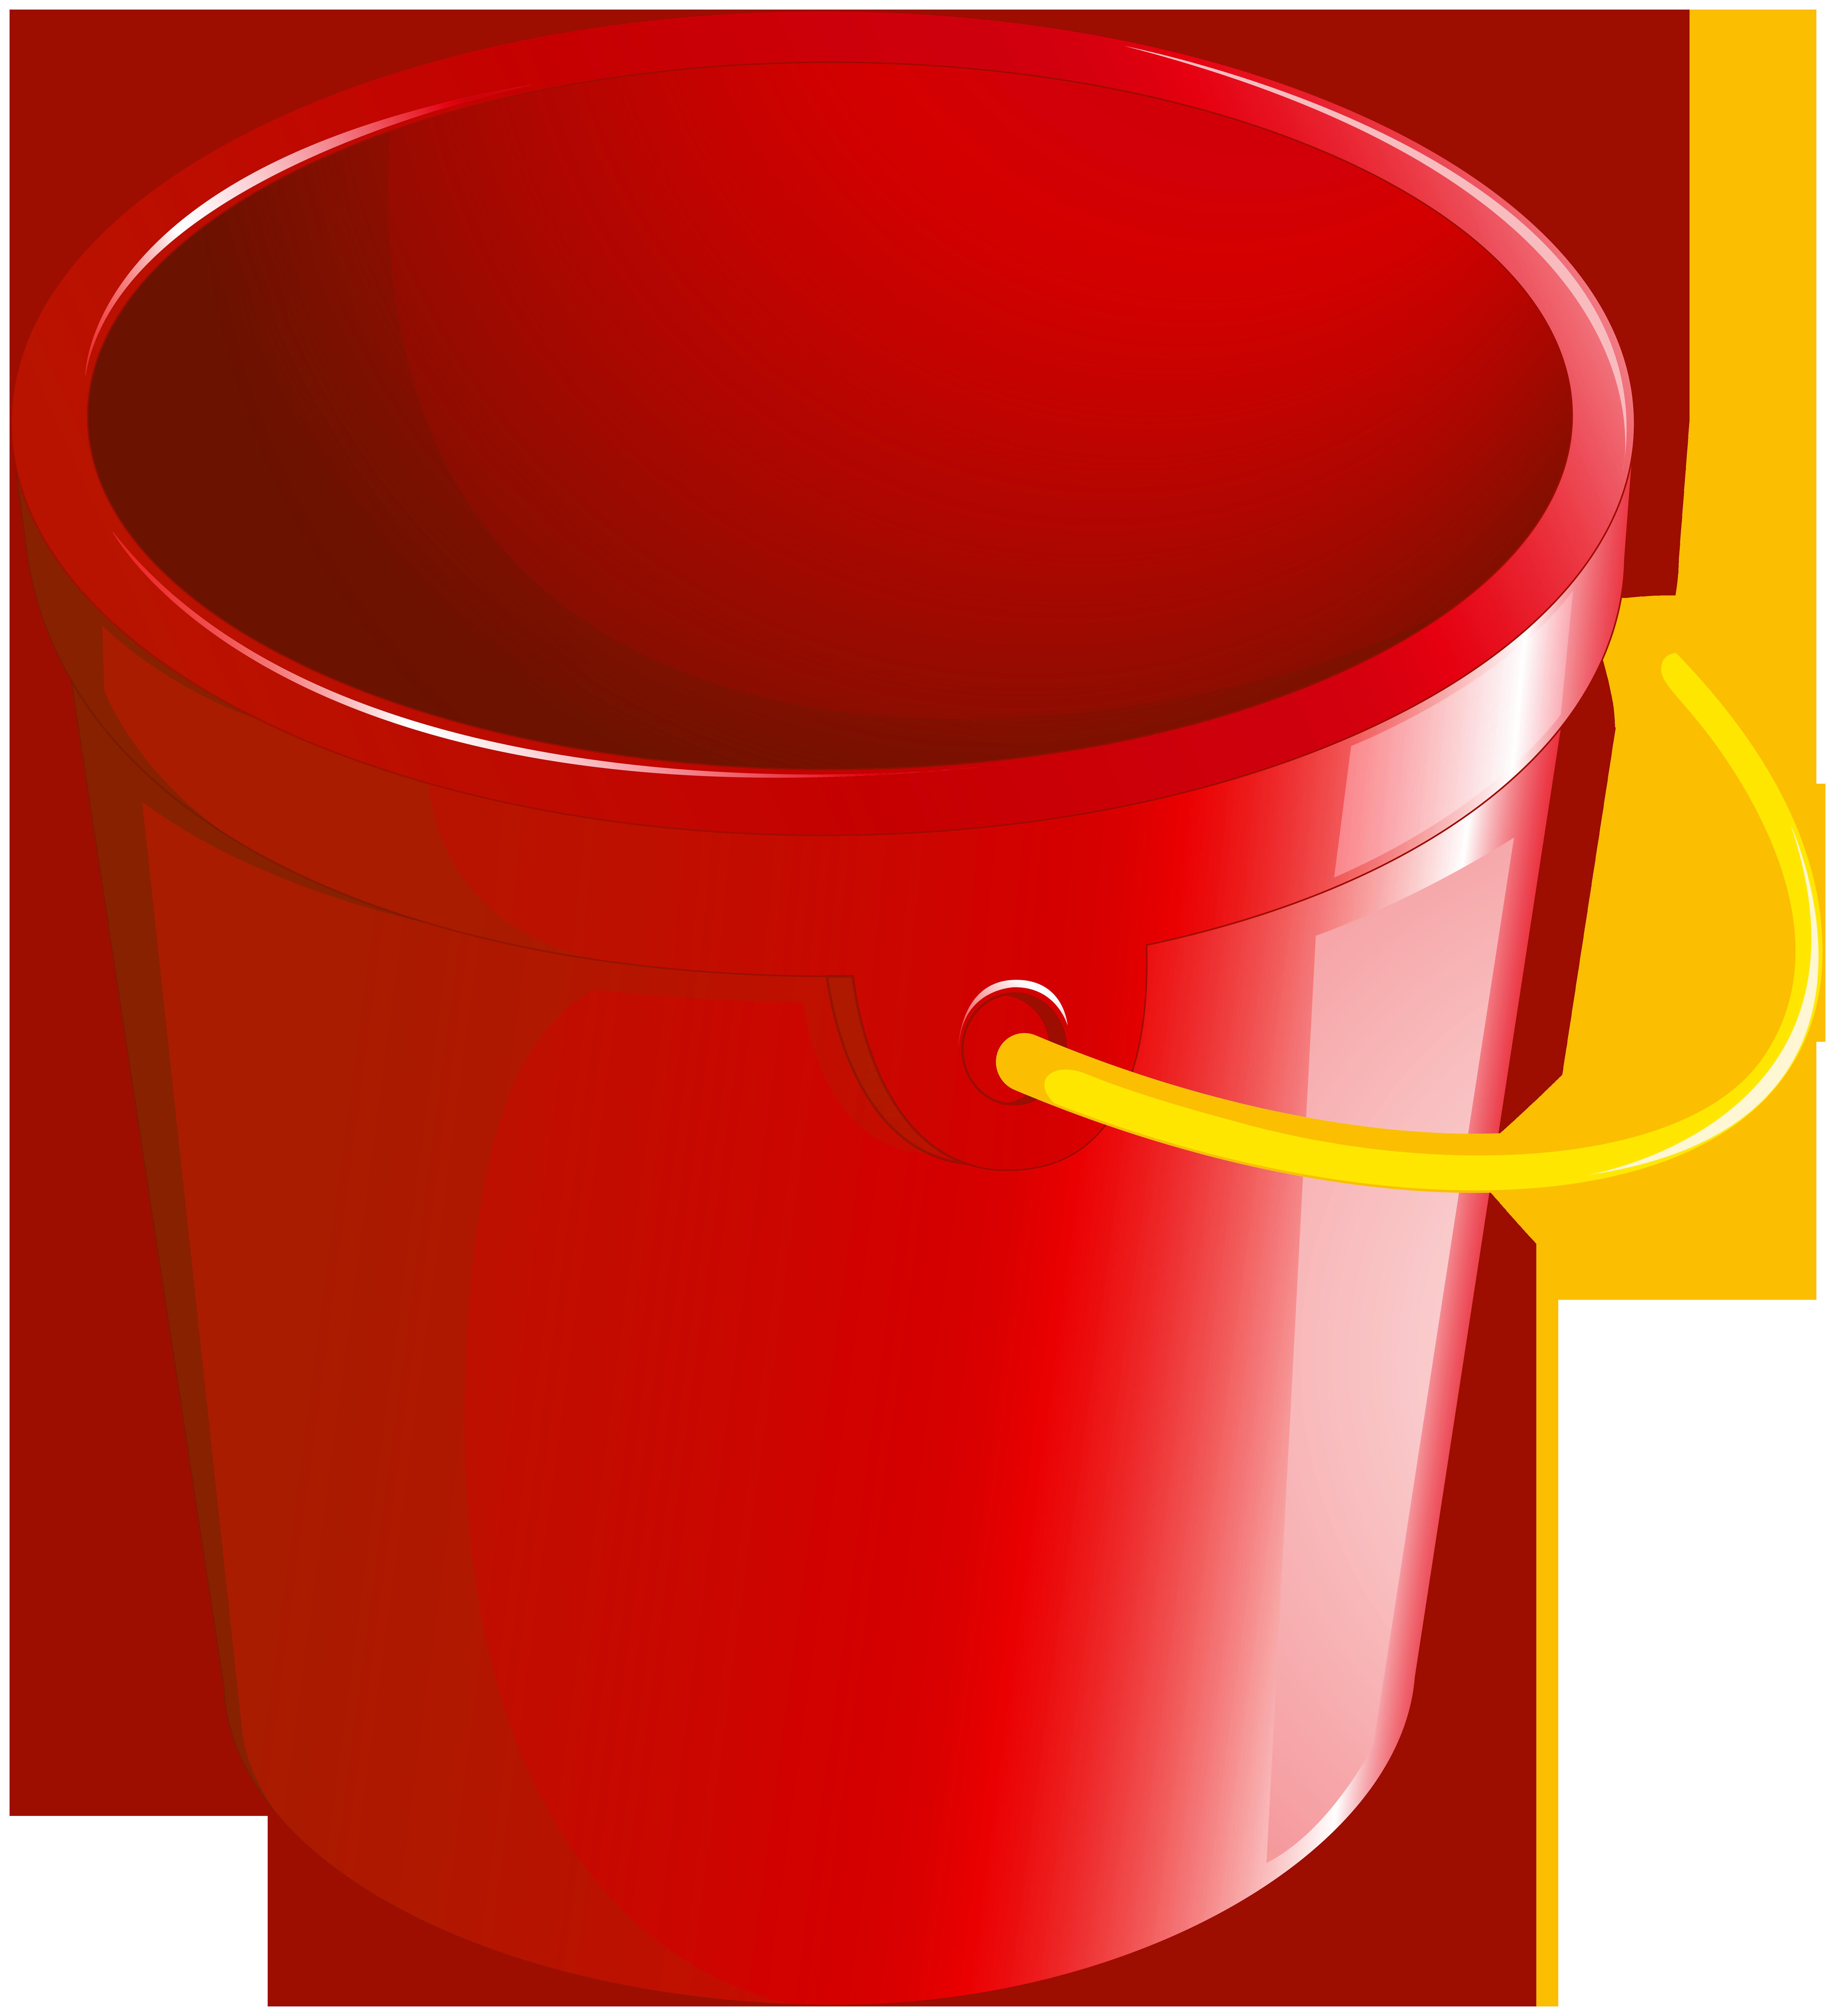 Bucket clipart red bucket. Png best web